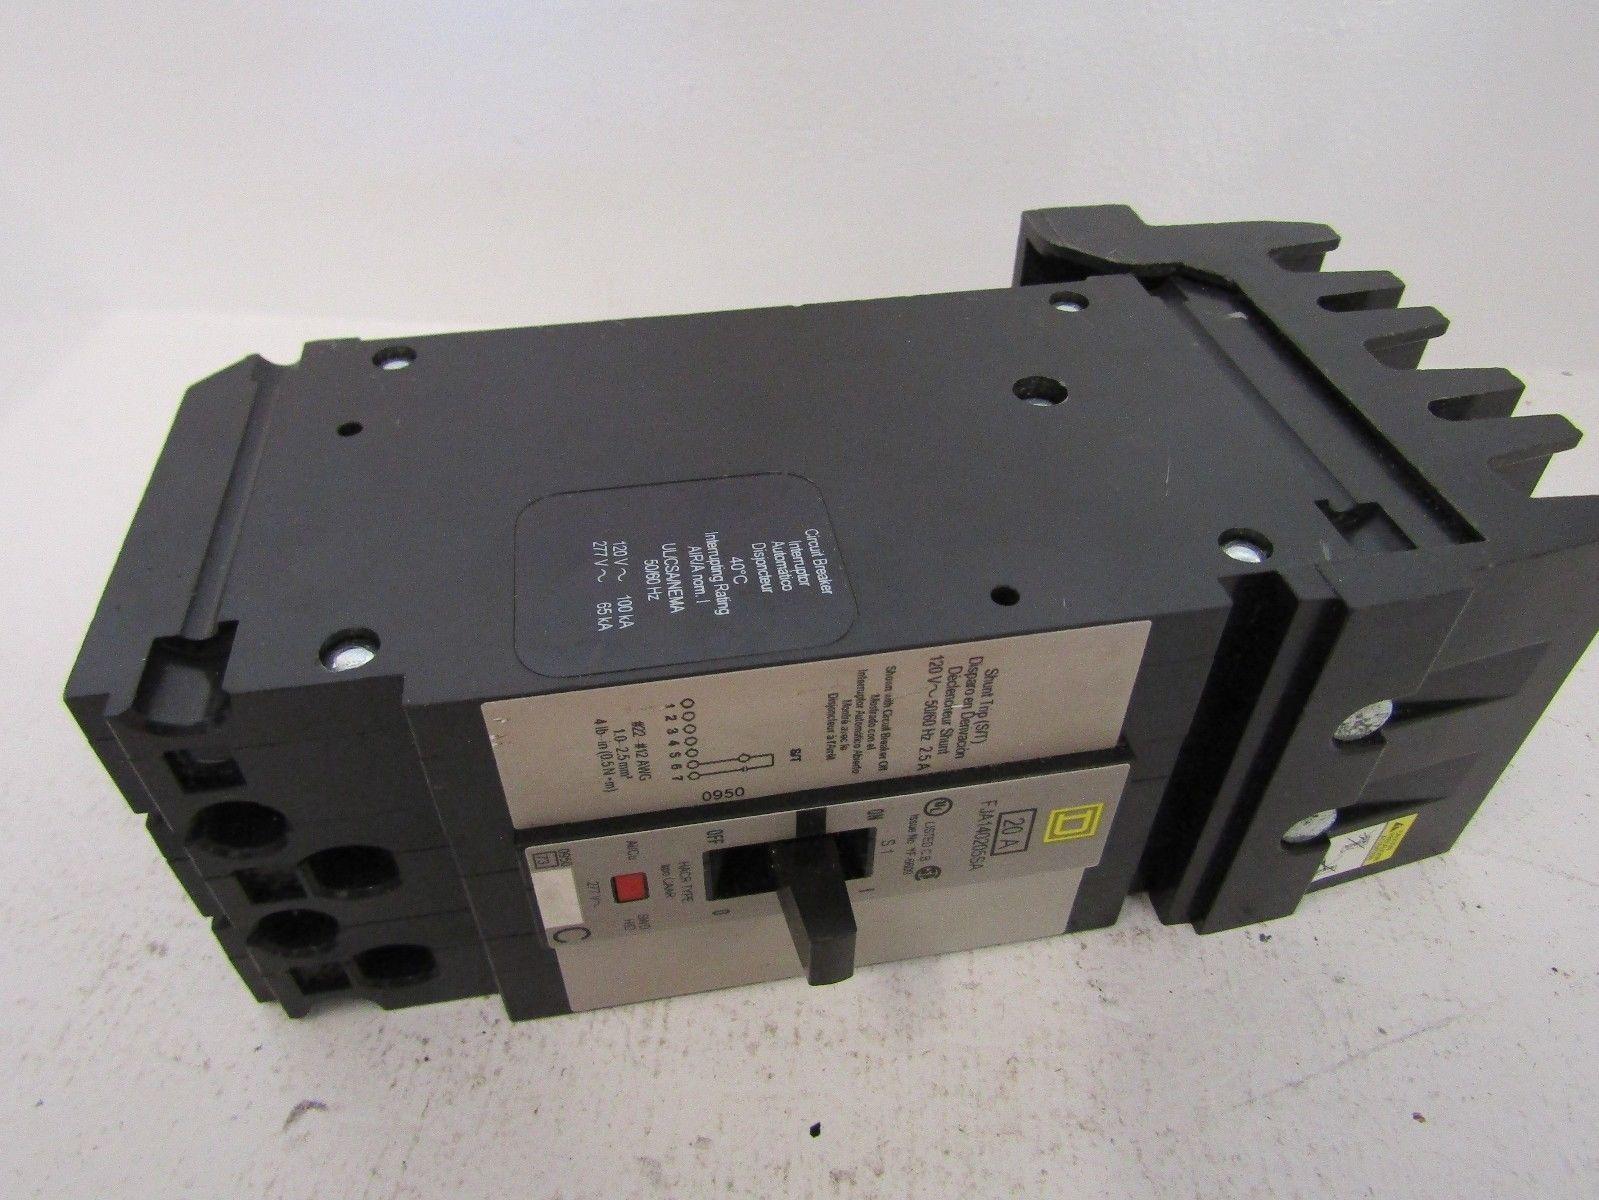 New Square D Fja140205sa 1 Pole 20 Amp 277 480 Volt Shunt Trip 25a Generator Circuit Breaker Lot Of 10 Ebay